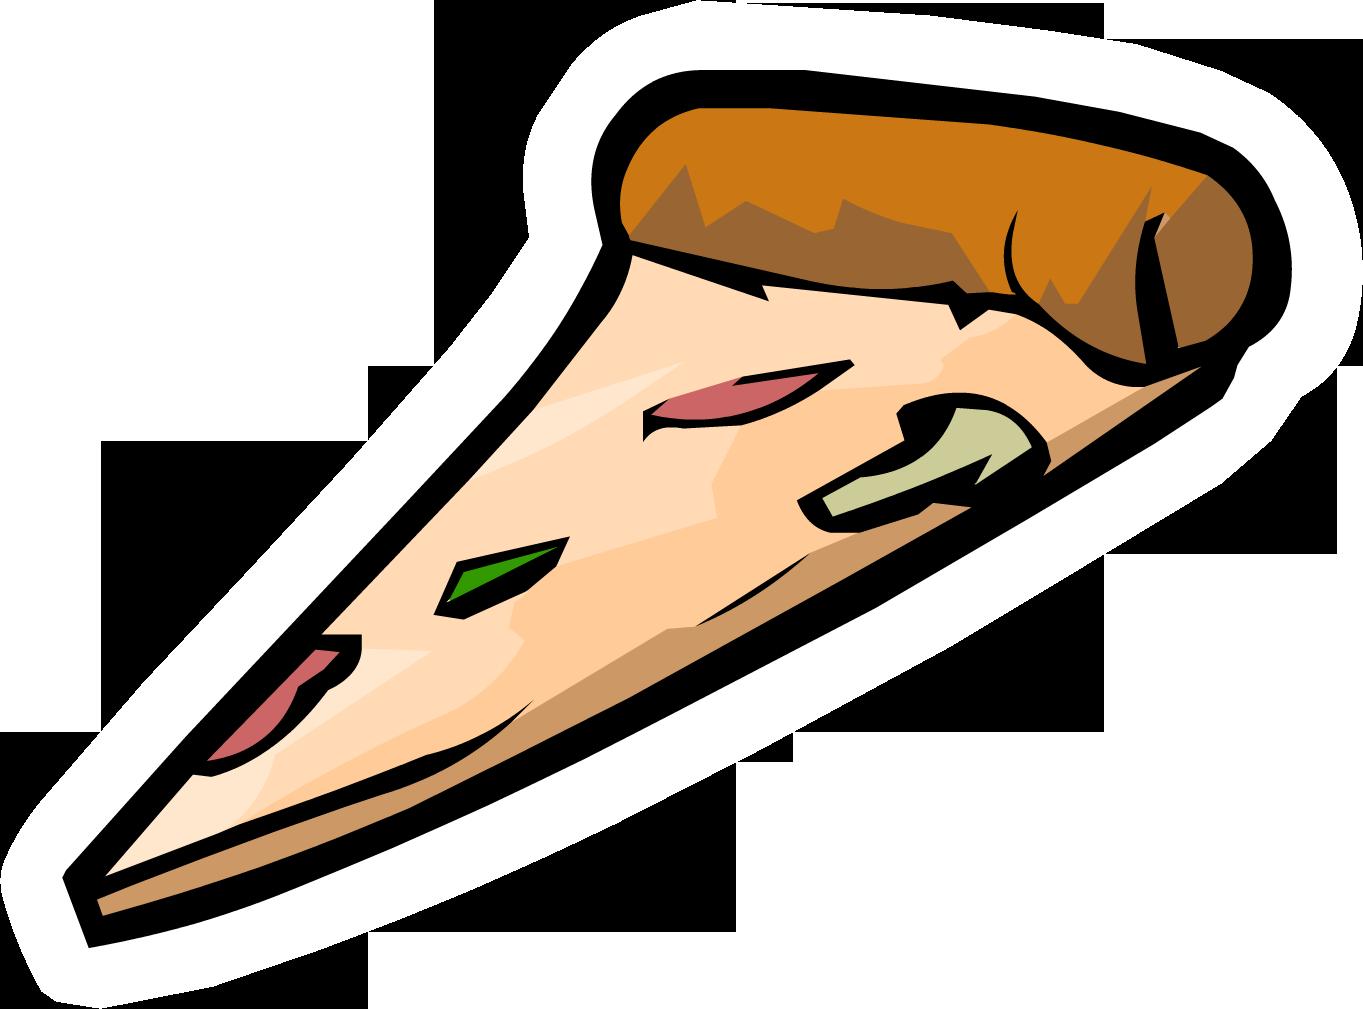 Cake or pie? - Club Penguin Wiki - The free, editable encyclopedia ...